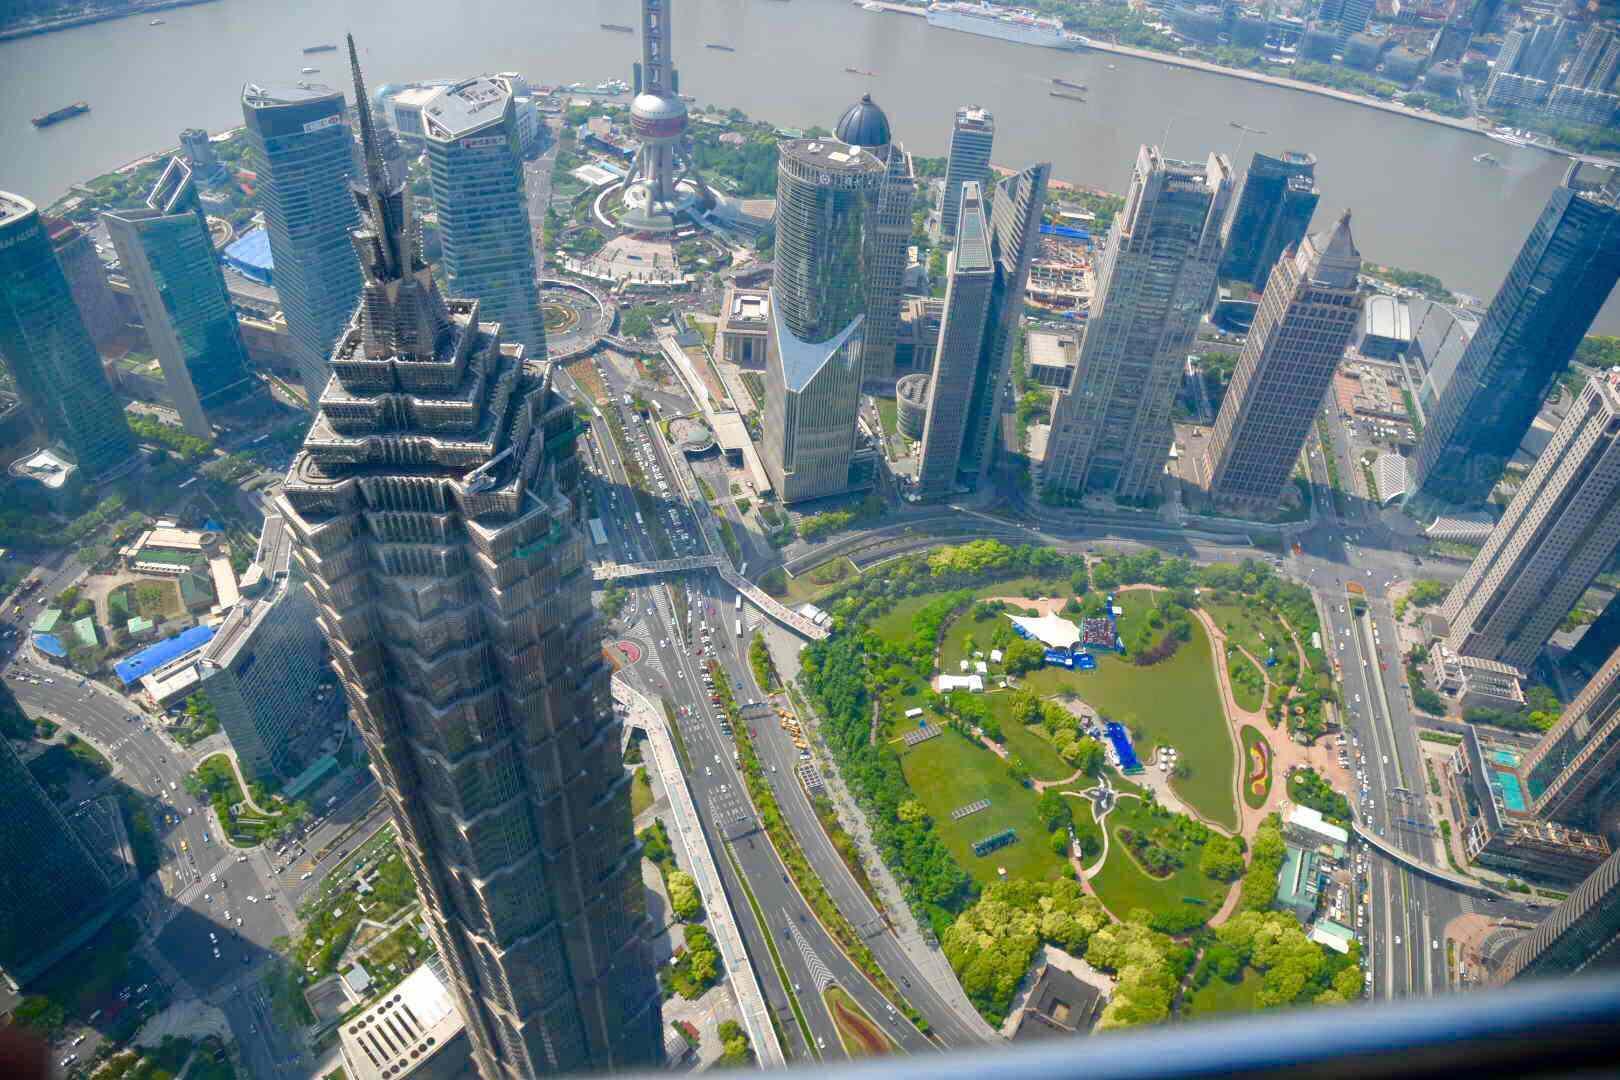 16_Days_Beijing_Xian_Lhasa_Chengdu_Shanghai_In-depth_China_Tour_14.jpg